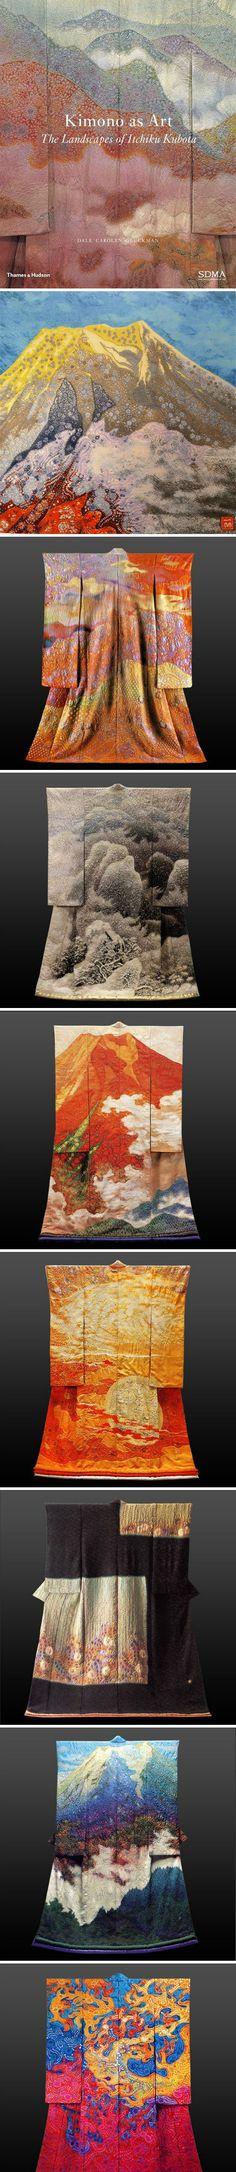 "Images from Publication: Kimono as Art - The landscape of Itchuku Kubota By Dale Carolyn Gluckman ""The first major book on Japanese textile artist Itchiku Kubota, published to accompany a touring exhibition."" #PurelyInspiration #ArtonTap"